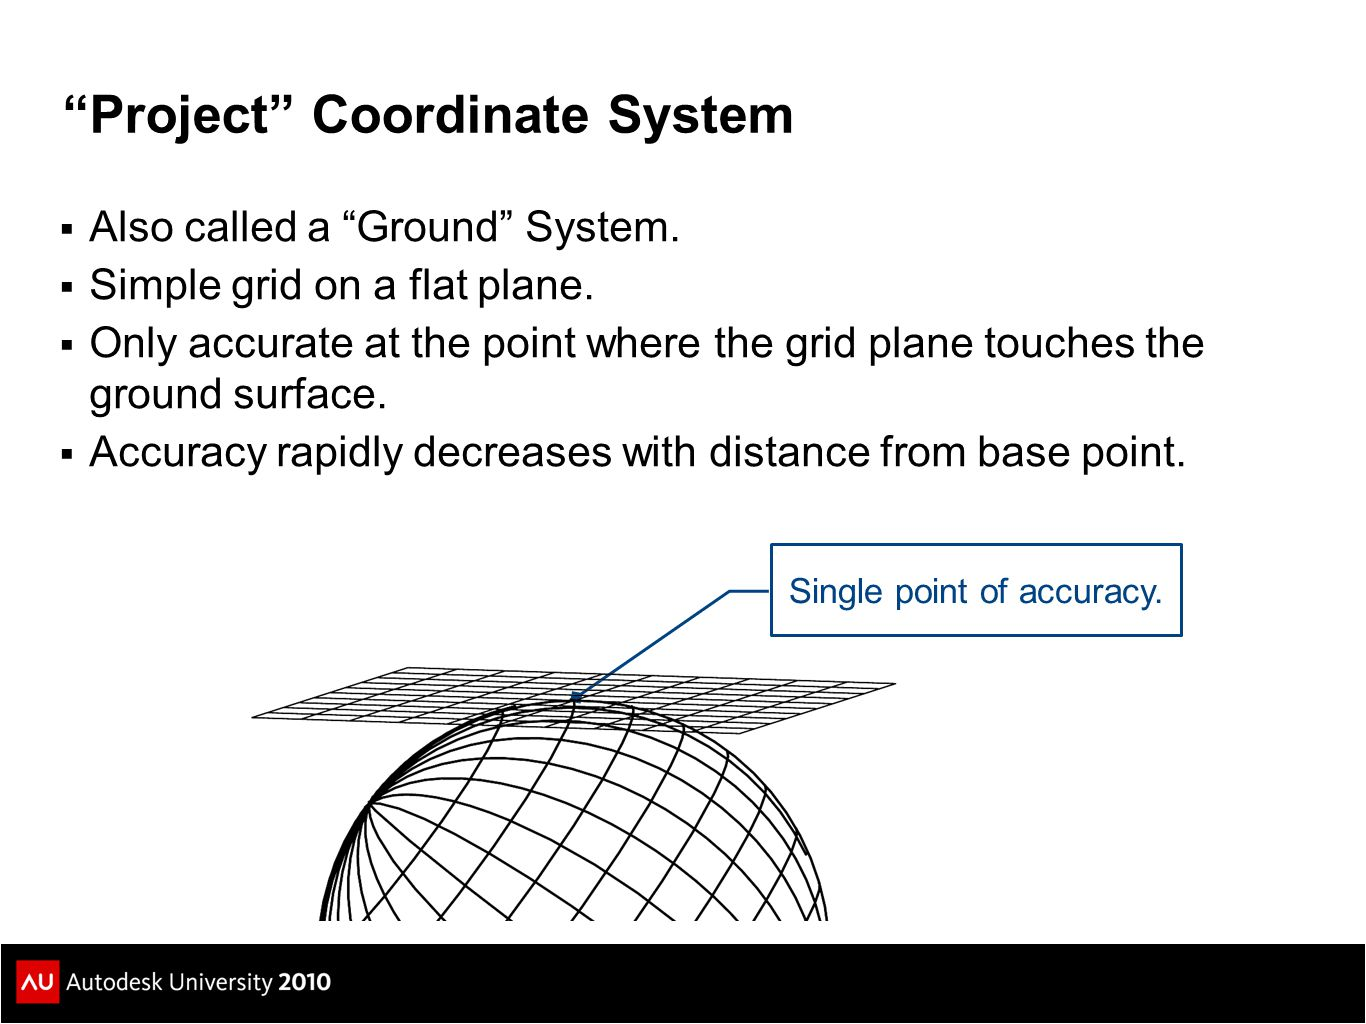 Prismoidal Formula Ellipsoid Projection Surface Distance on Ellipsoid (d ellipse ) kbkb d grid = distance on grid d ellipse = distance on ellipsoid k a = grid scale factor at first point k ab = grid scale factor at midpoint k b = grid scale factor at second point d grid = d ellipse · k a + 4·k ab + k b 6 k ab kaka Distance on Grid (d grid )  Used to convert between grid distance and ellipsoidal distance.